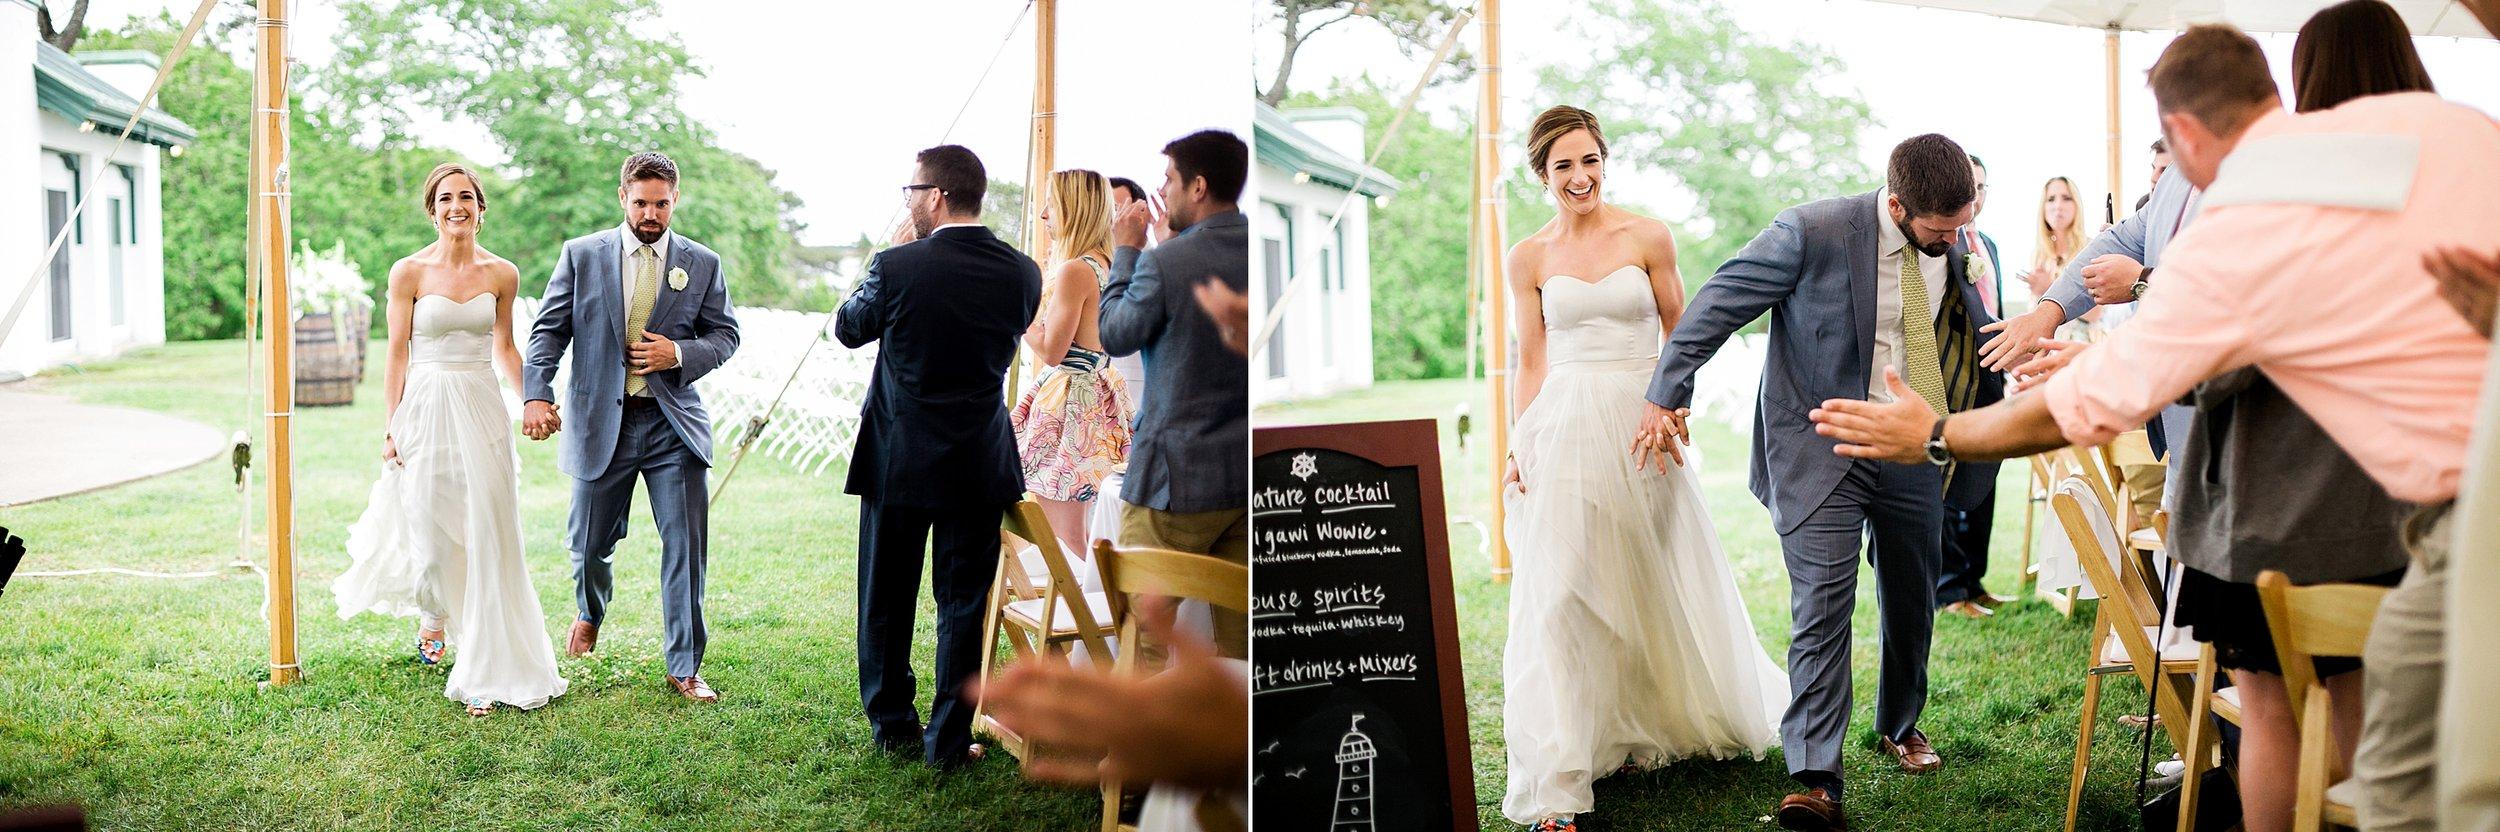 054 los angeles wedding photographer todd danforth photography cape cod.jpg